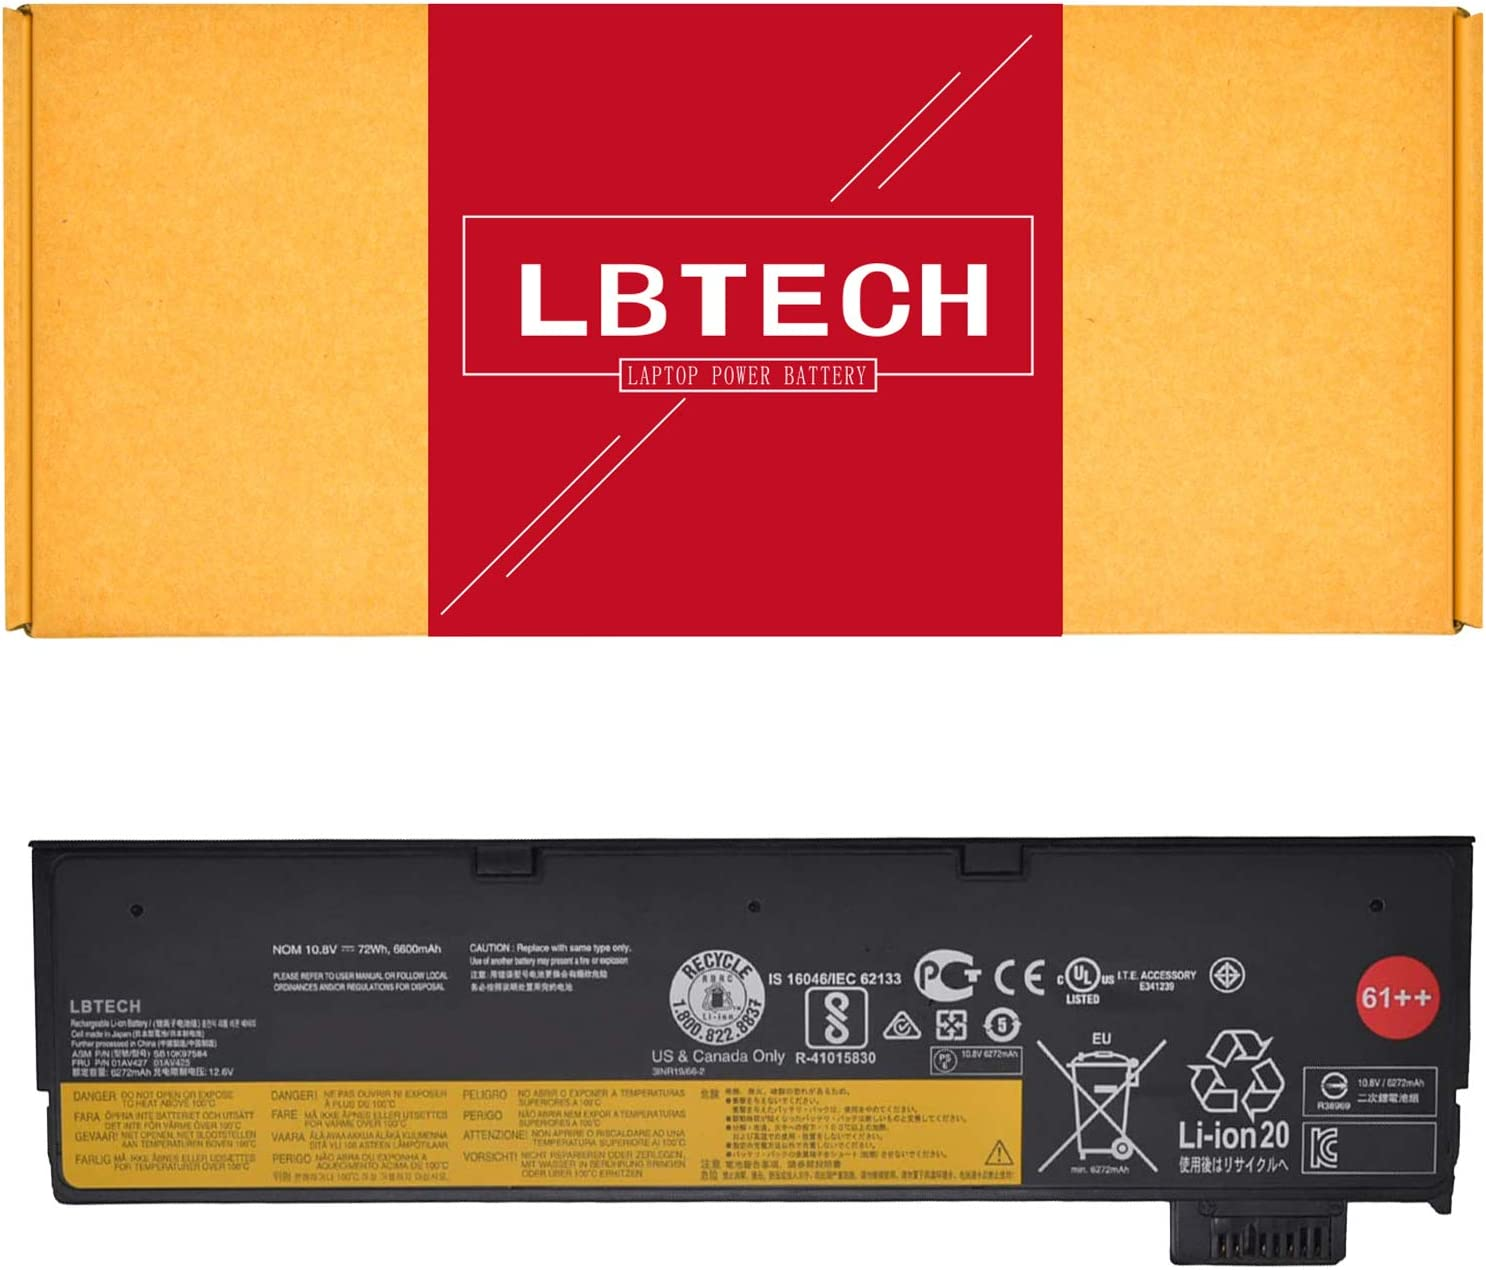 Bateria 01av425 Sb10k97582 61++ Para Thinkpad T470 T480 P51s